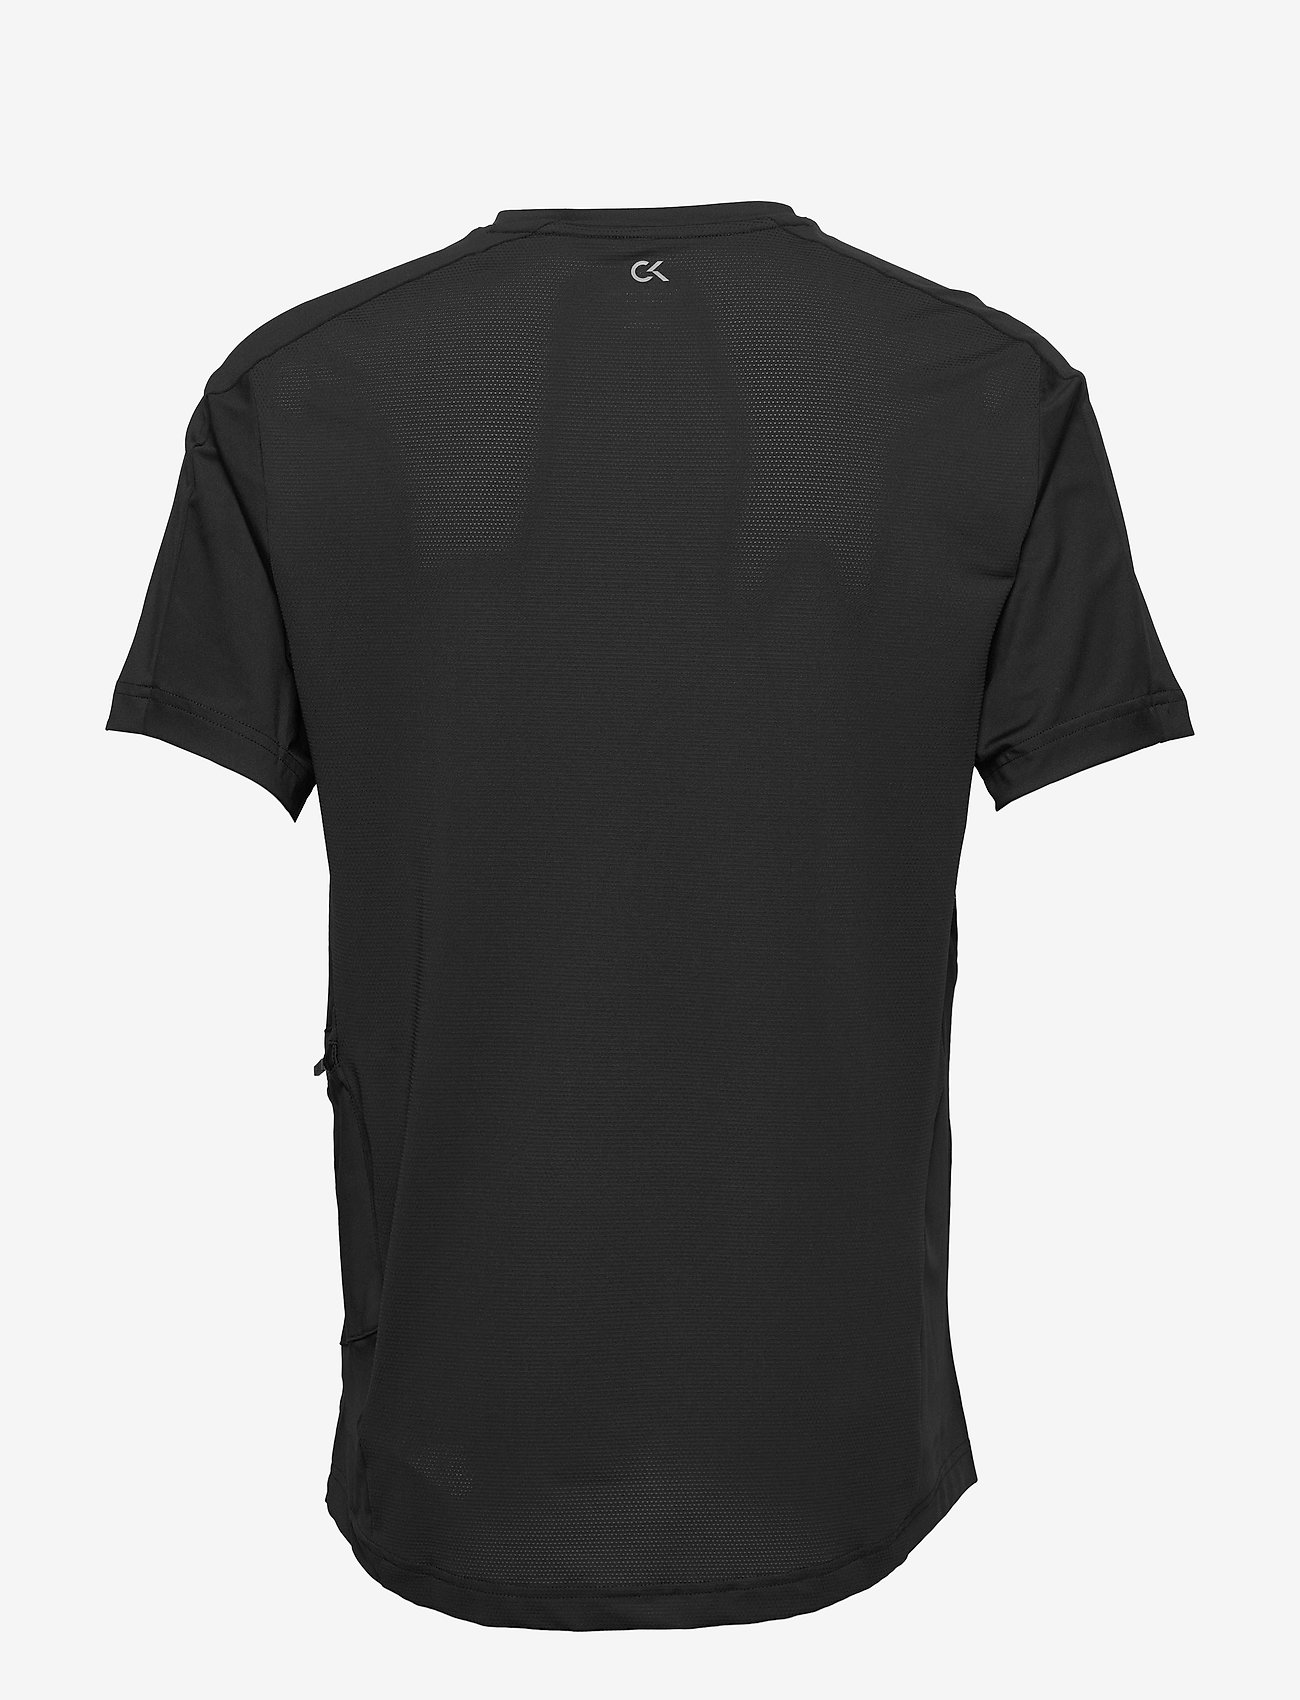 Calvin Klein Performance - SHORT SLEEVE T-SHIRT - sports tops - ck black/ck black/color reflec - 1